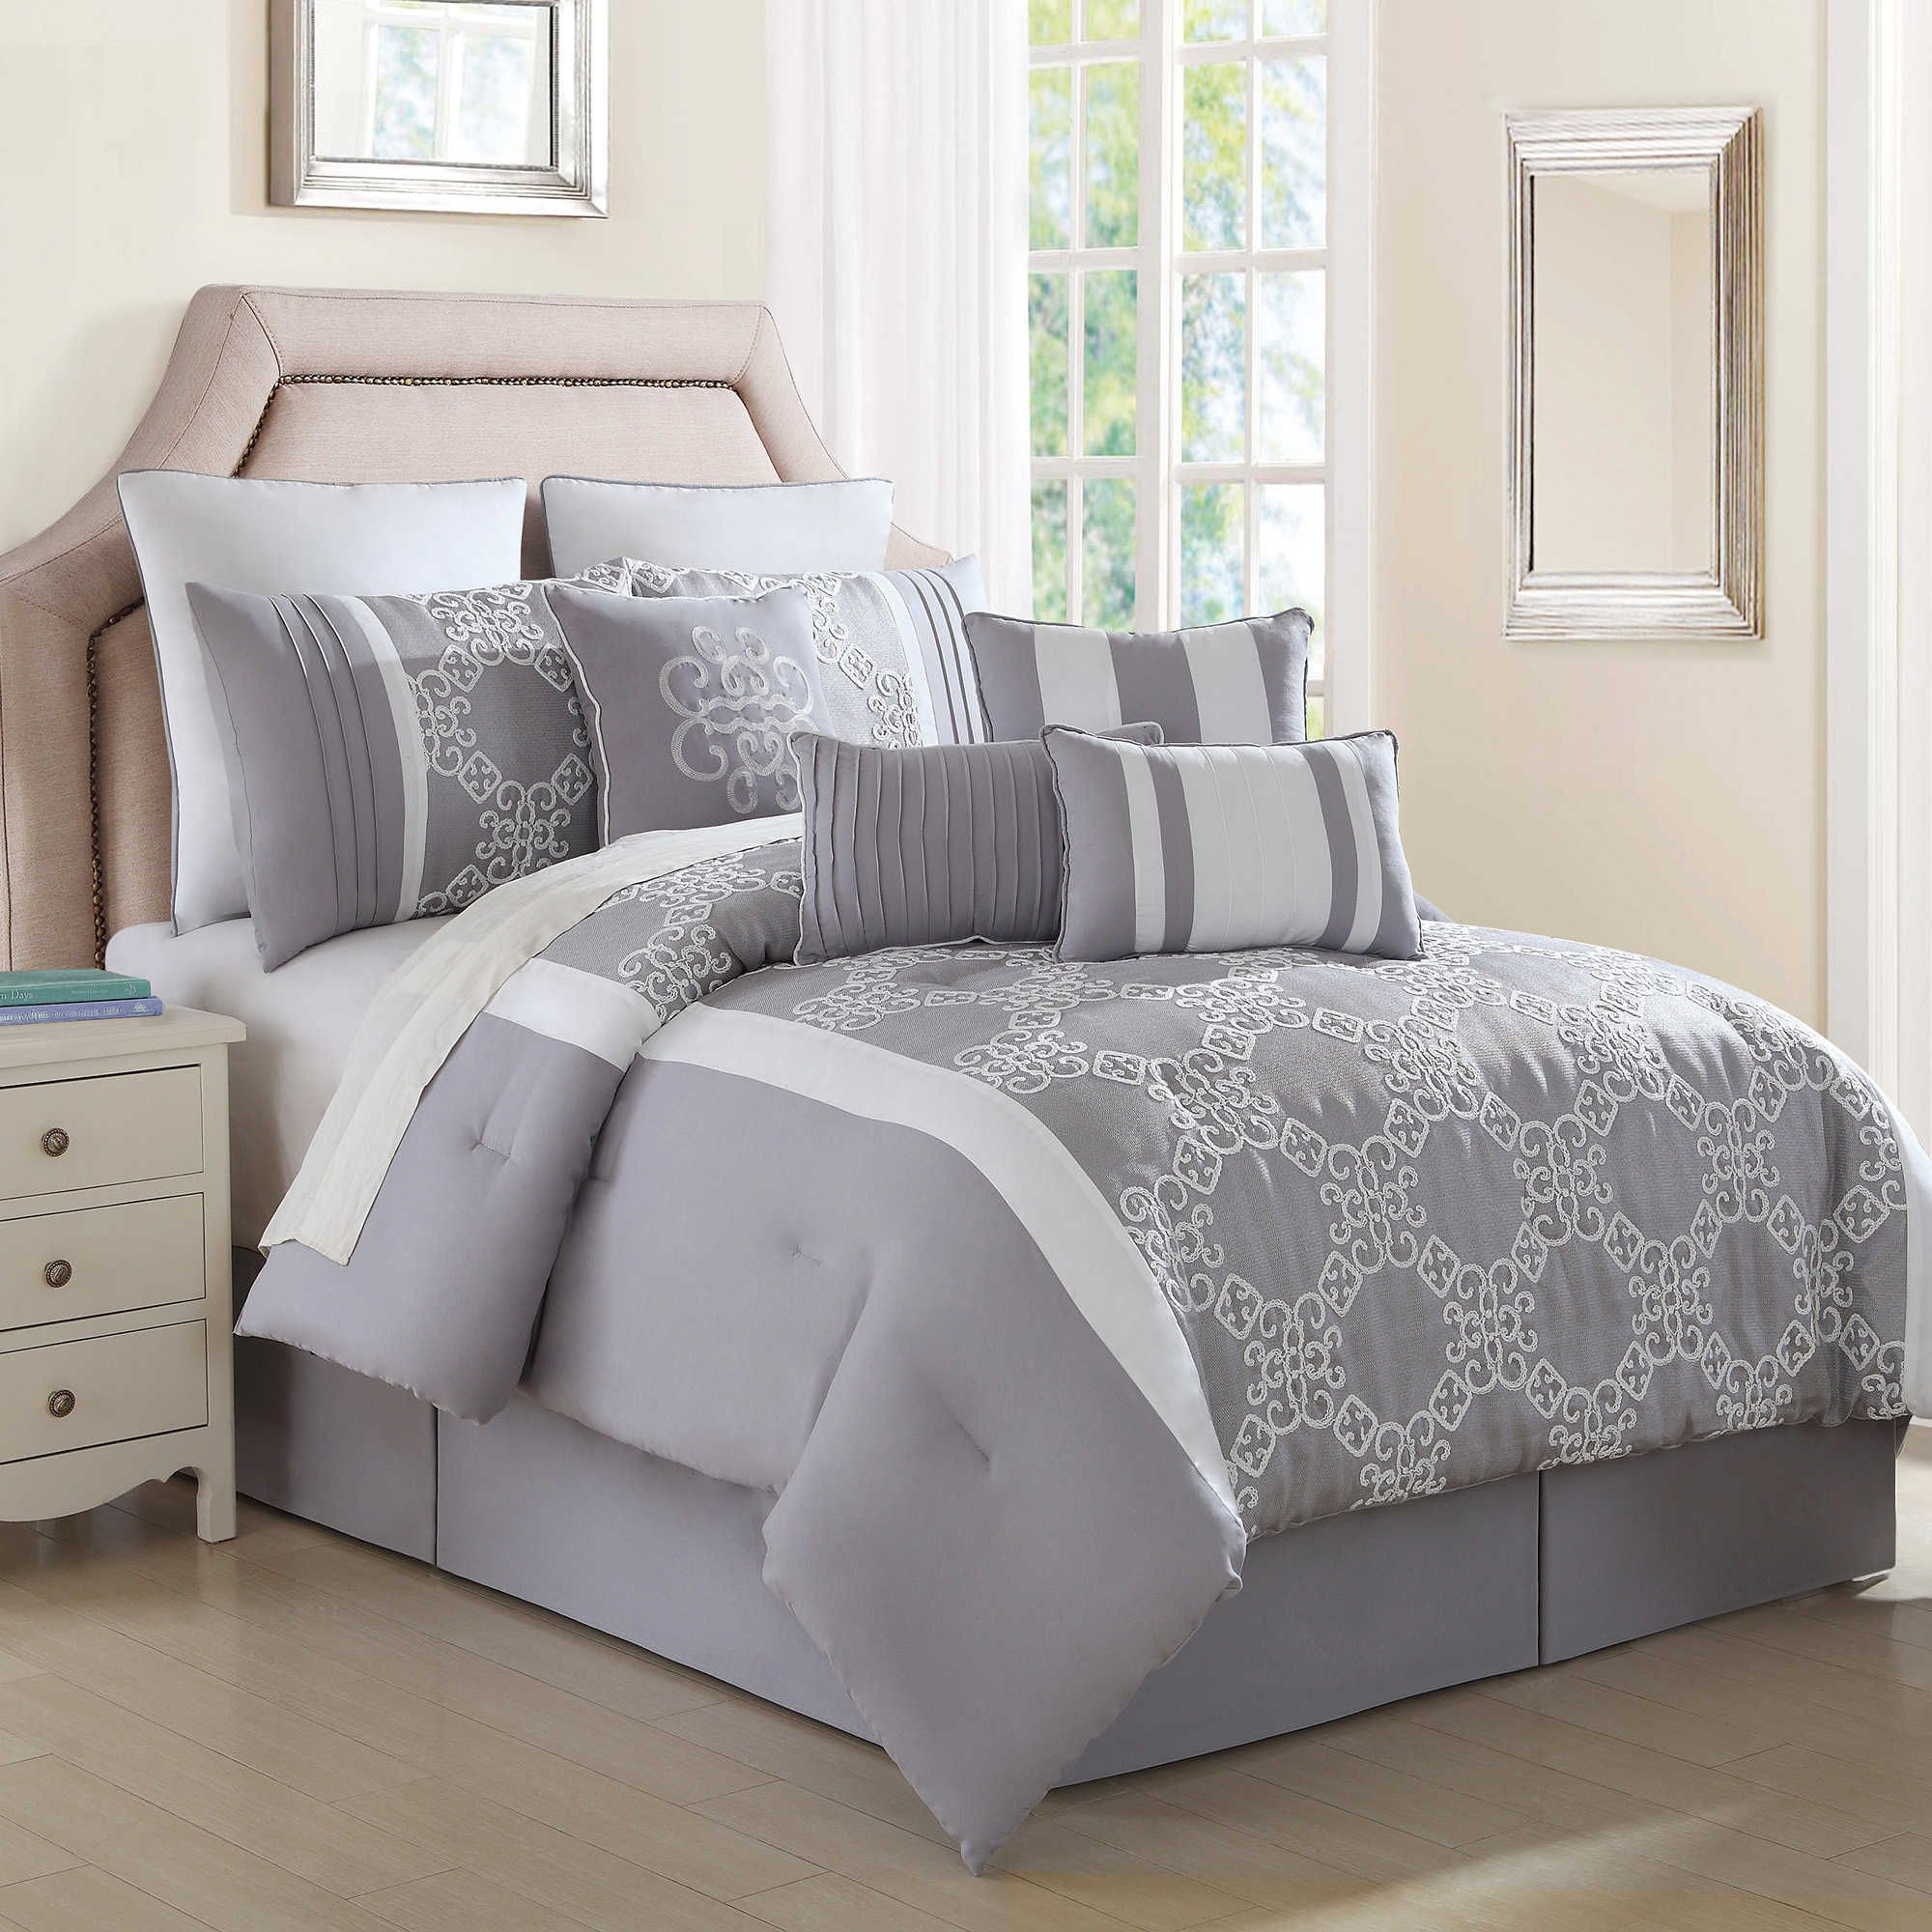 Lemiuex 10Piece Comforter Set in Grey/White Comforter